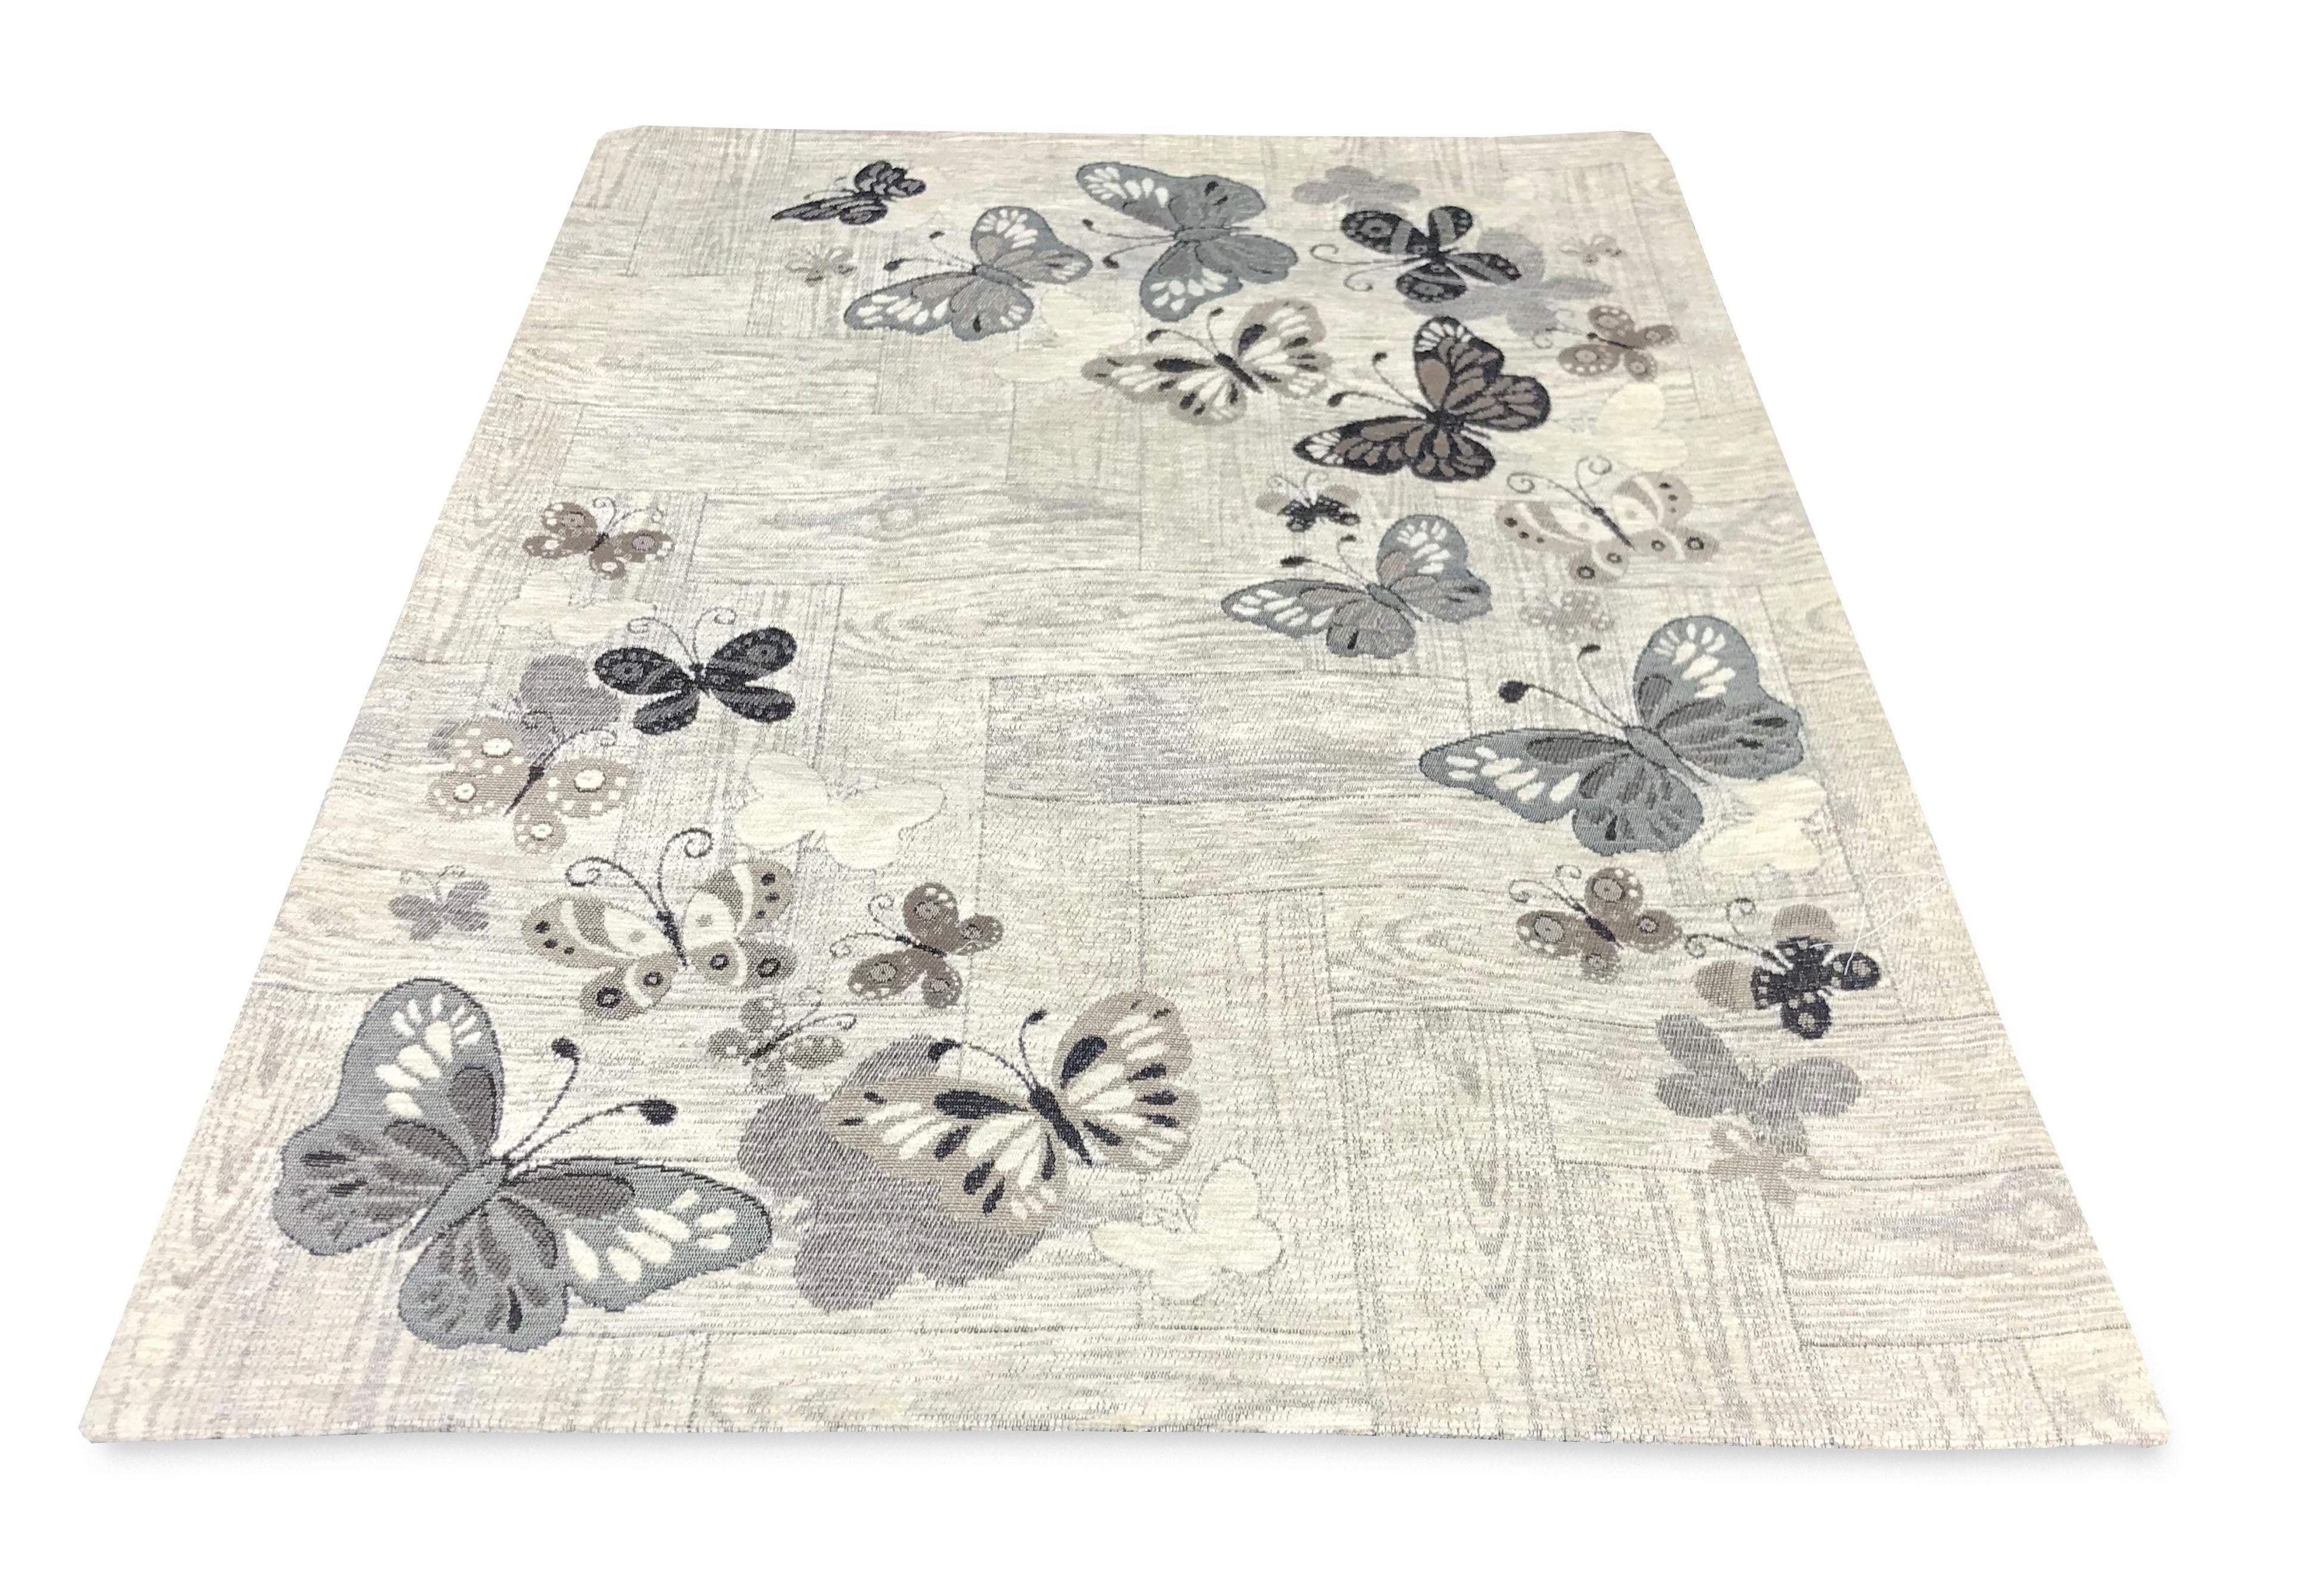 Tappeti Bagno Su Misura Torino tappeto in varie misure, made in italy